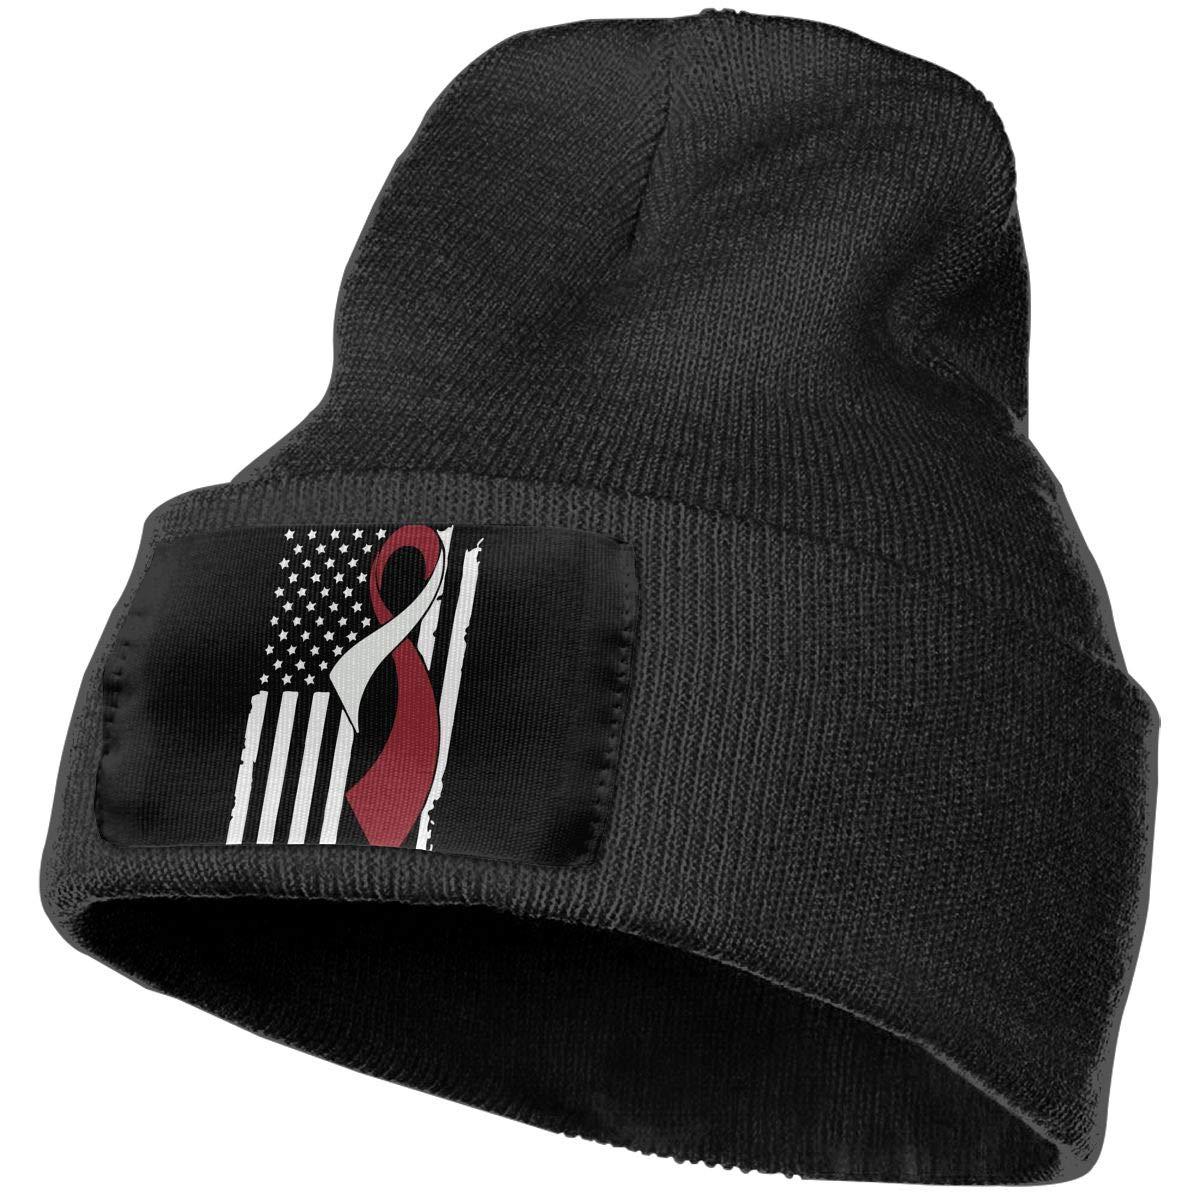 Head Neck Cancer Awareness Flag Men Women Knit Hats Stretchy /& Soft Ski Cap Beanie